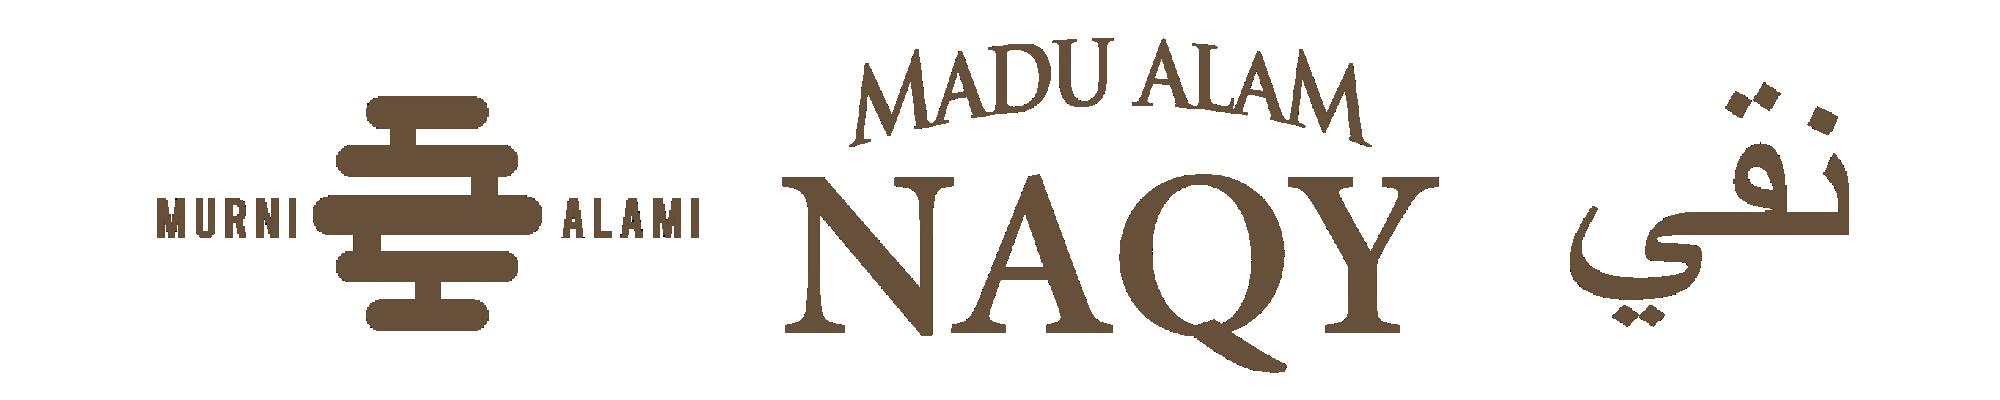 Madu Alam Naqy